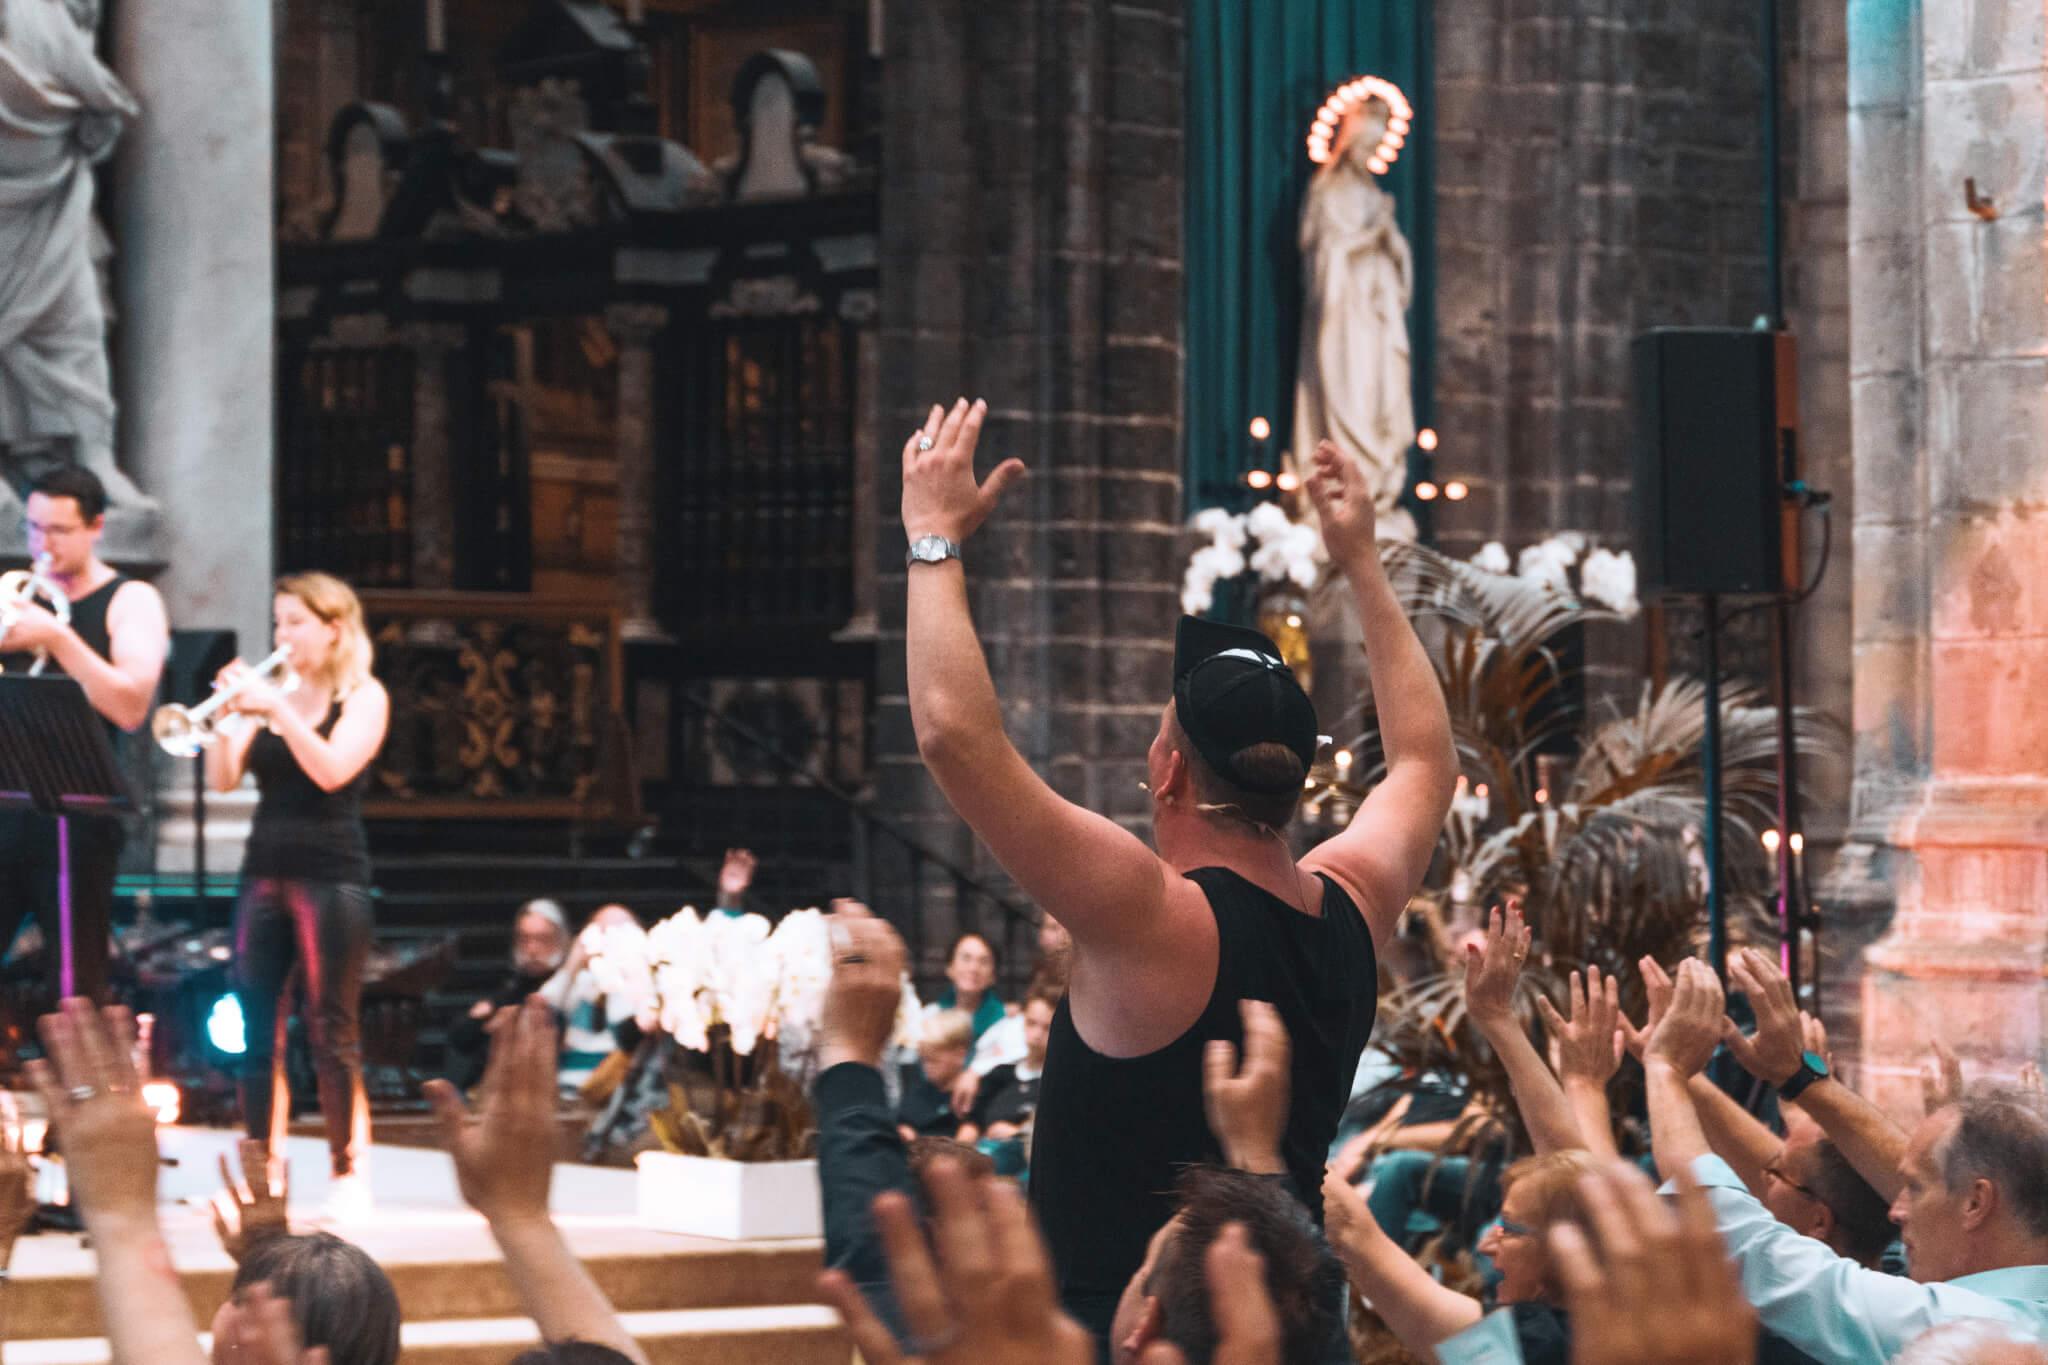 Die Verdammte Spielerei Concert Gentse Feesten Gent Sint Baafs Cathedraal